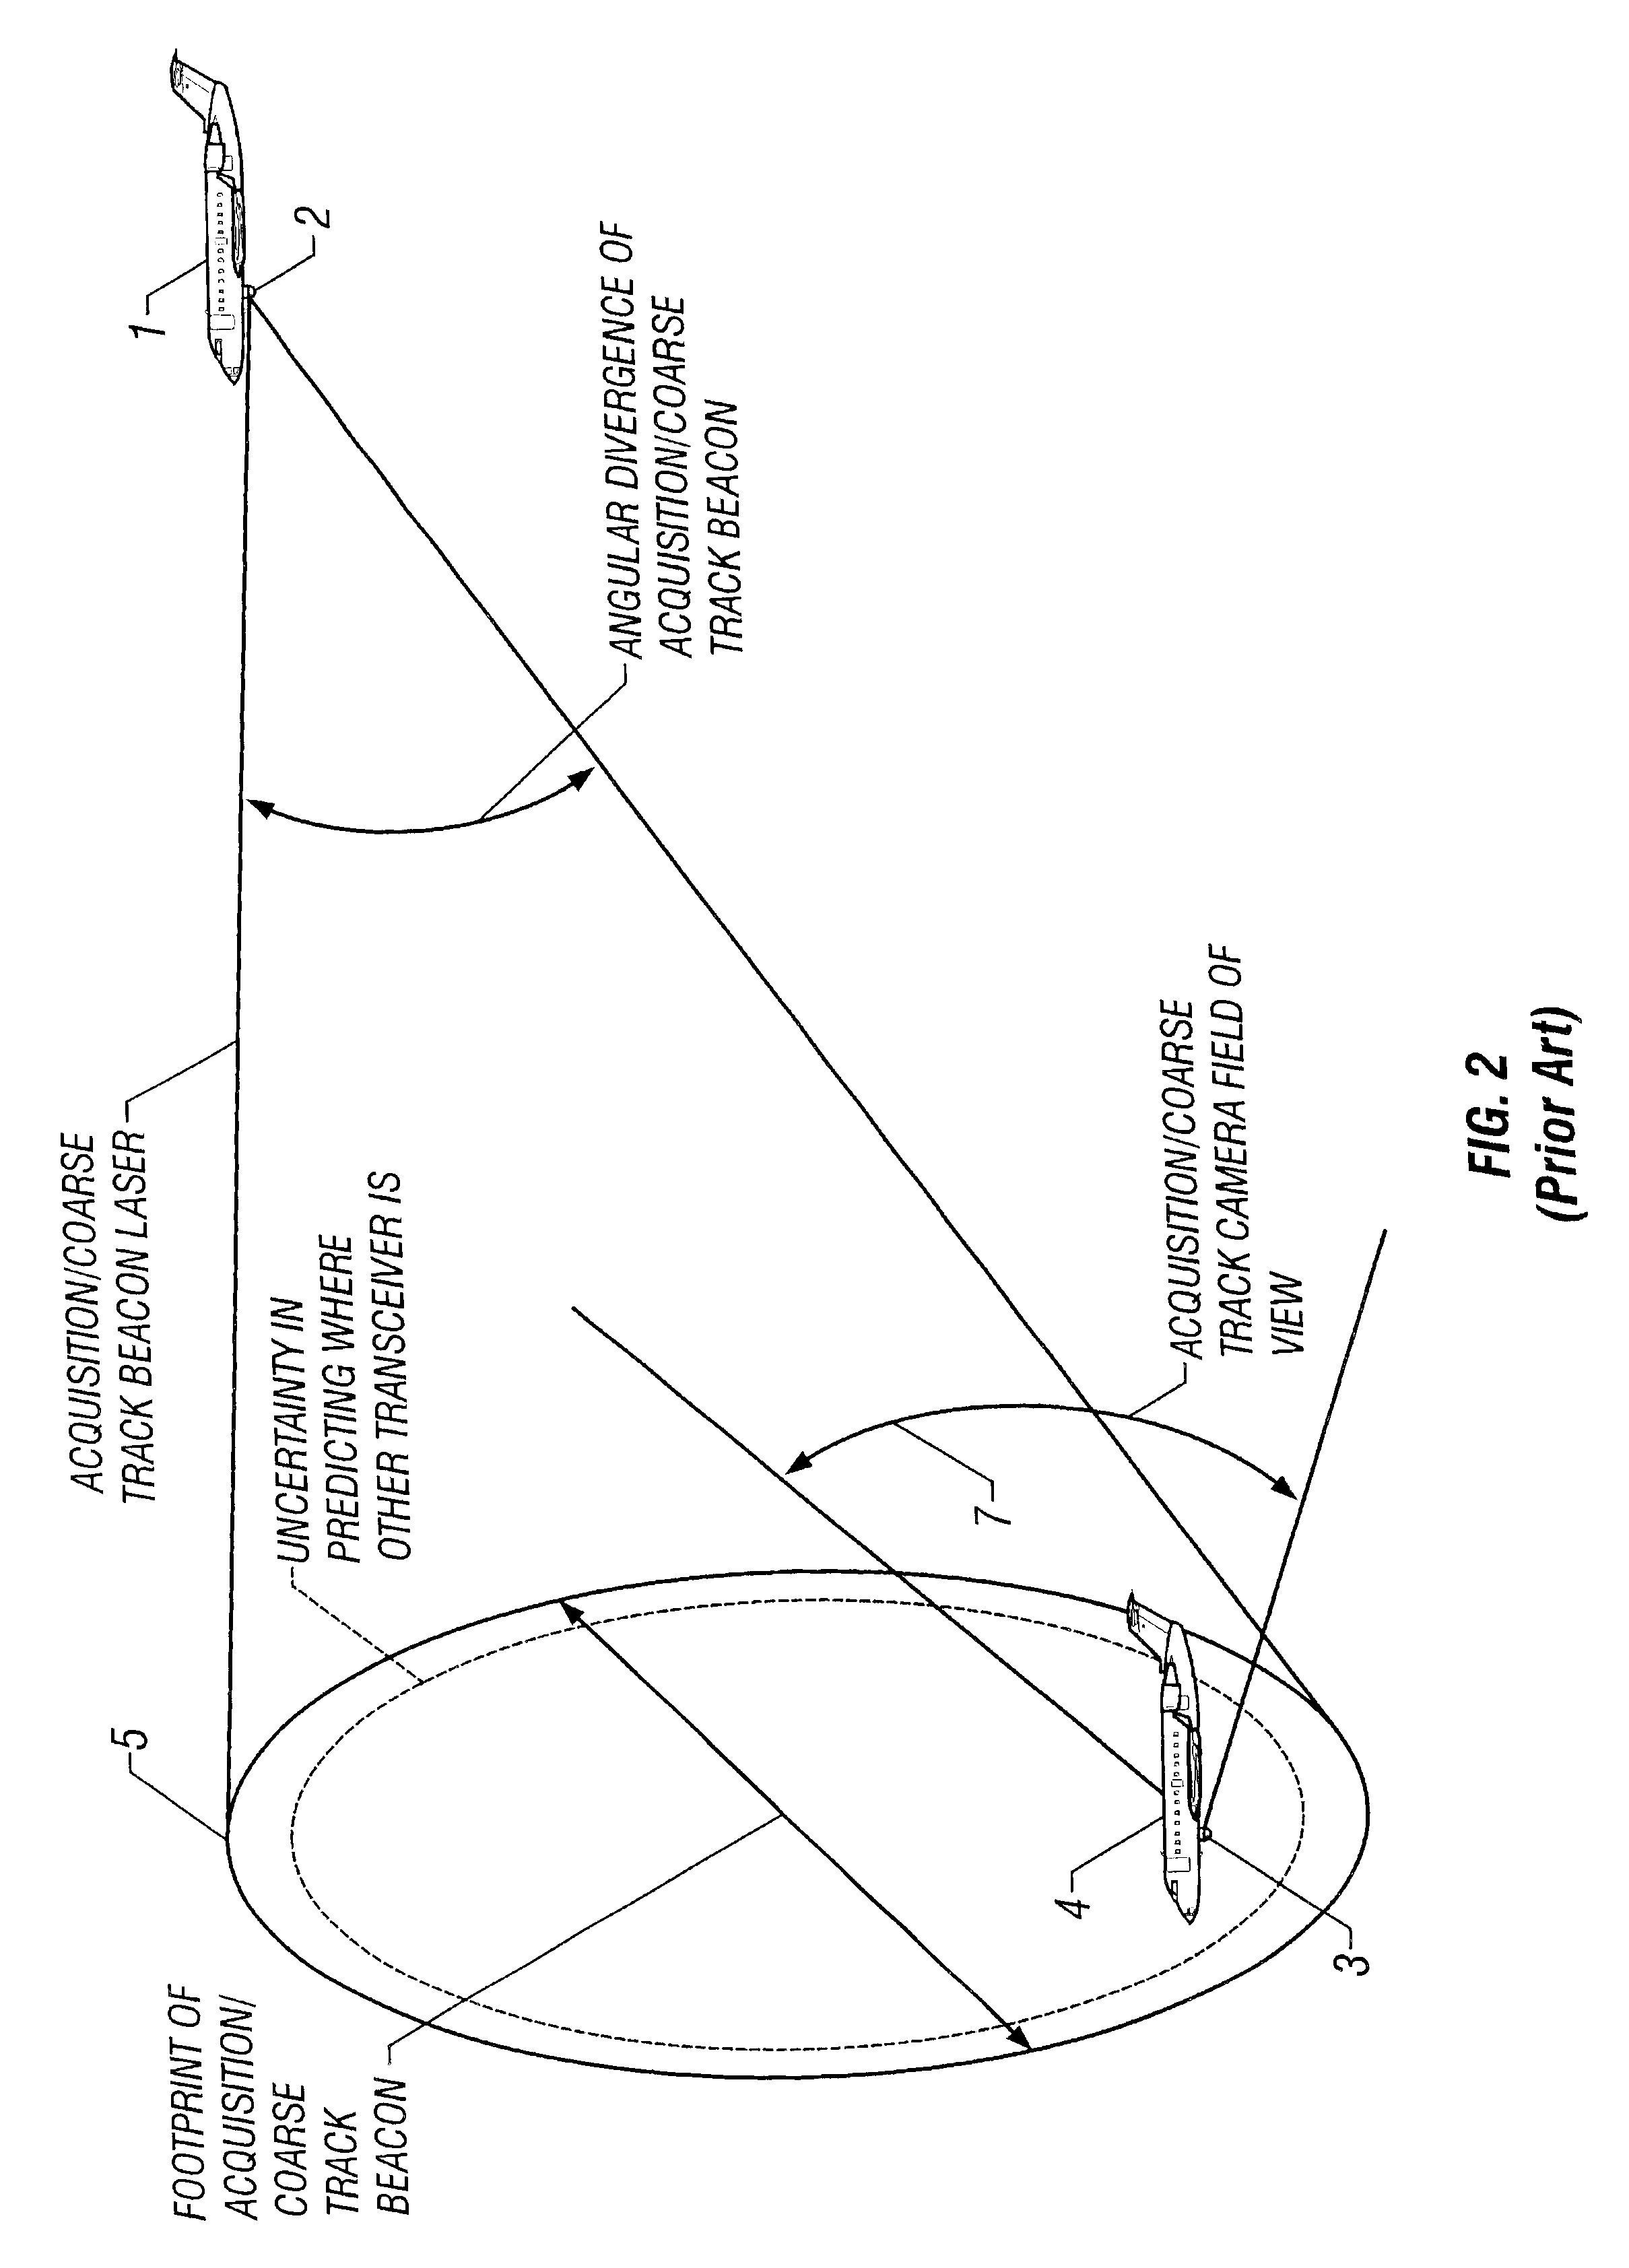 The laser communication system